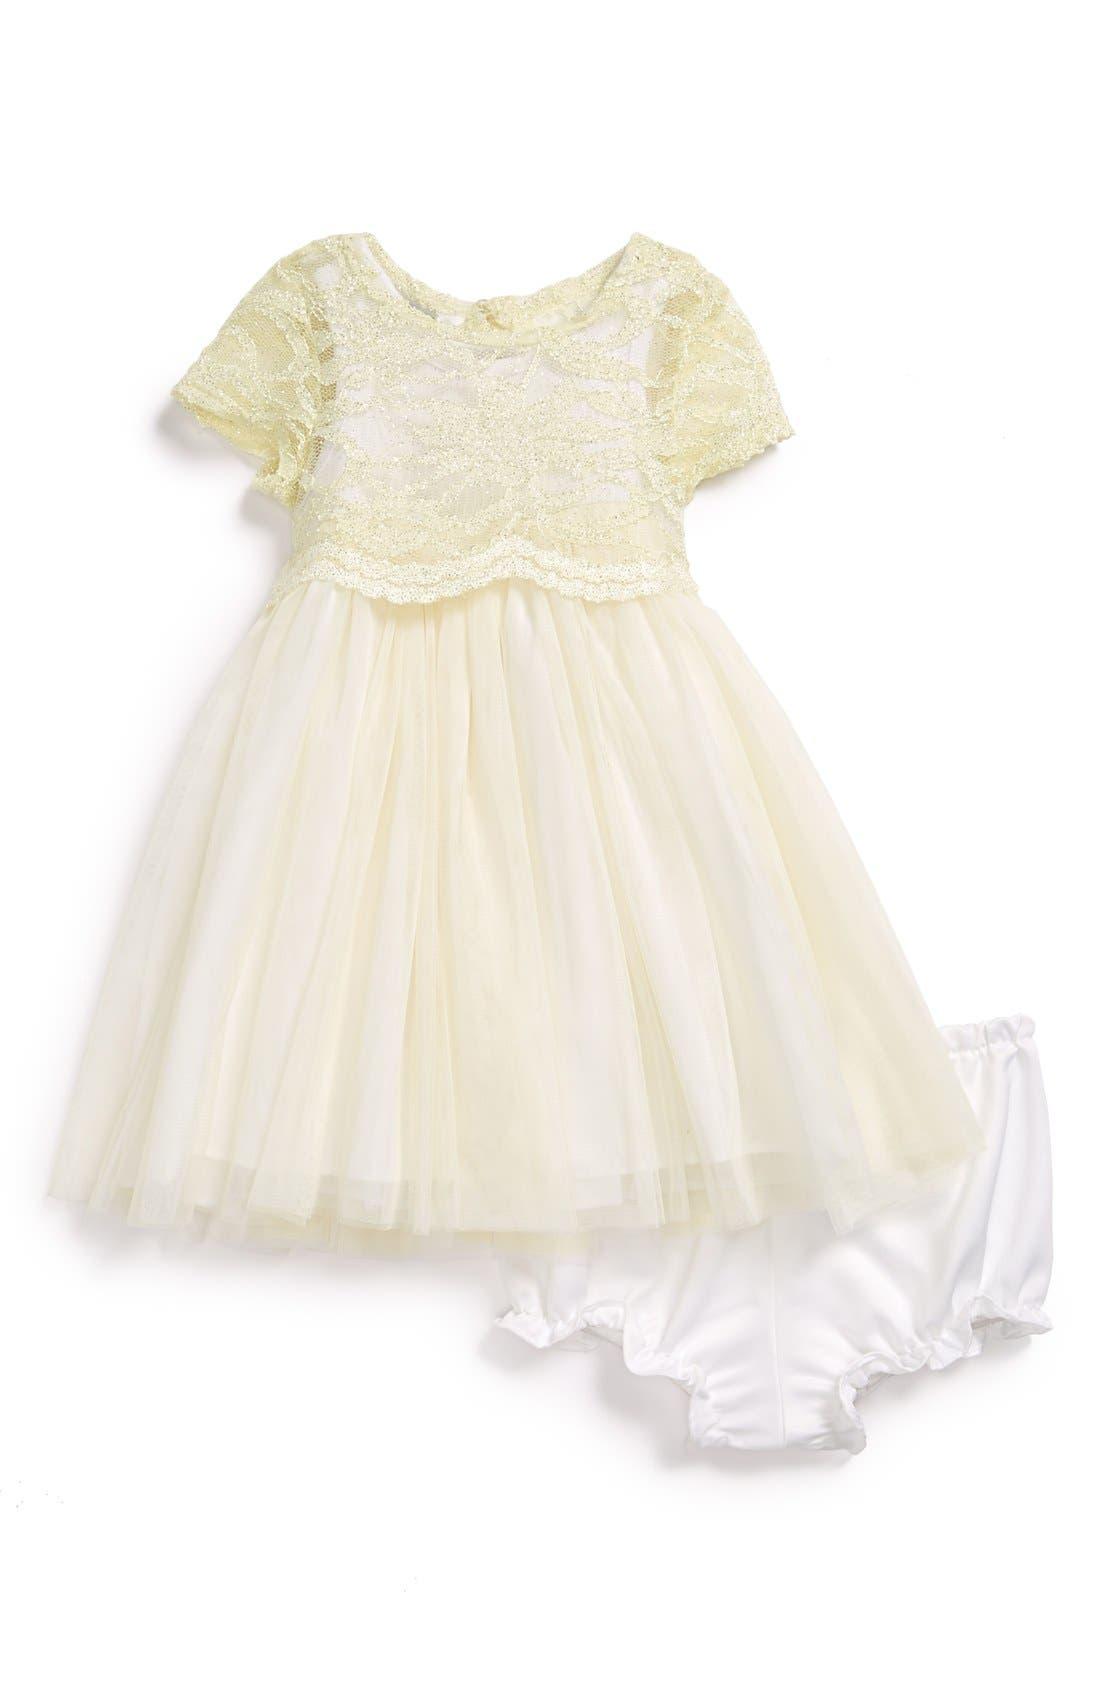 Alternate Image 1 Selected - Pippa & Julie 'Princess' Dress & Bloomers (Baby Girls)